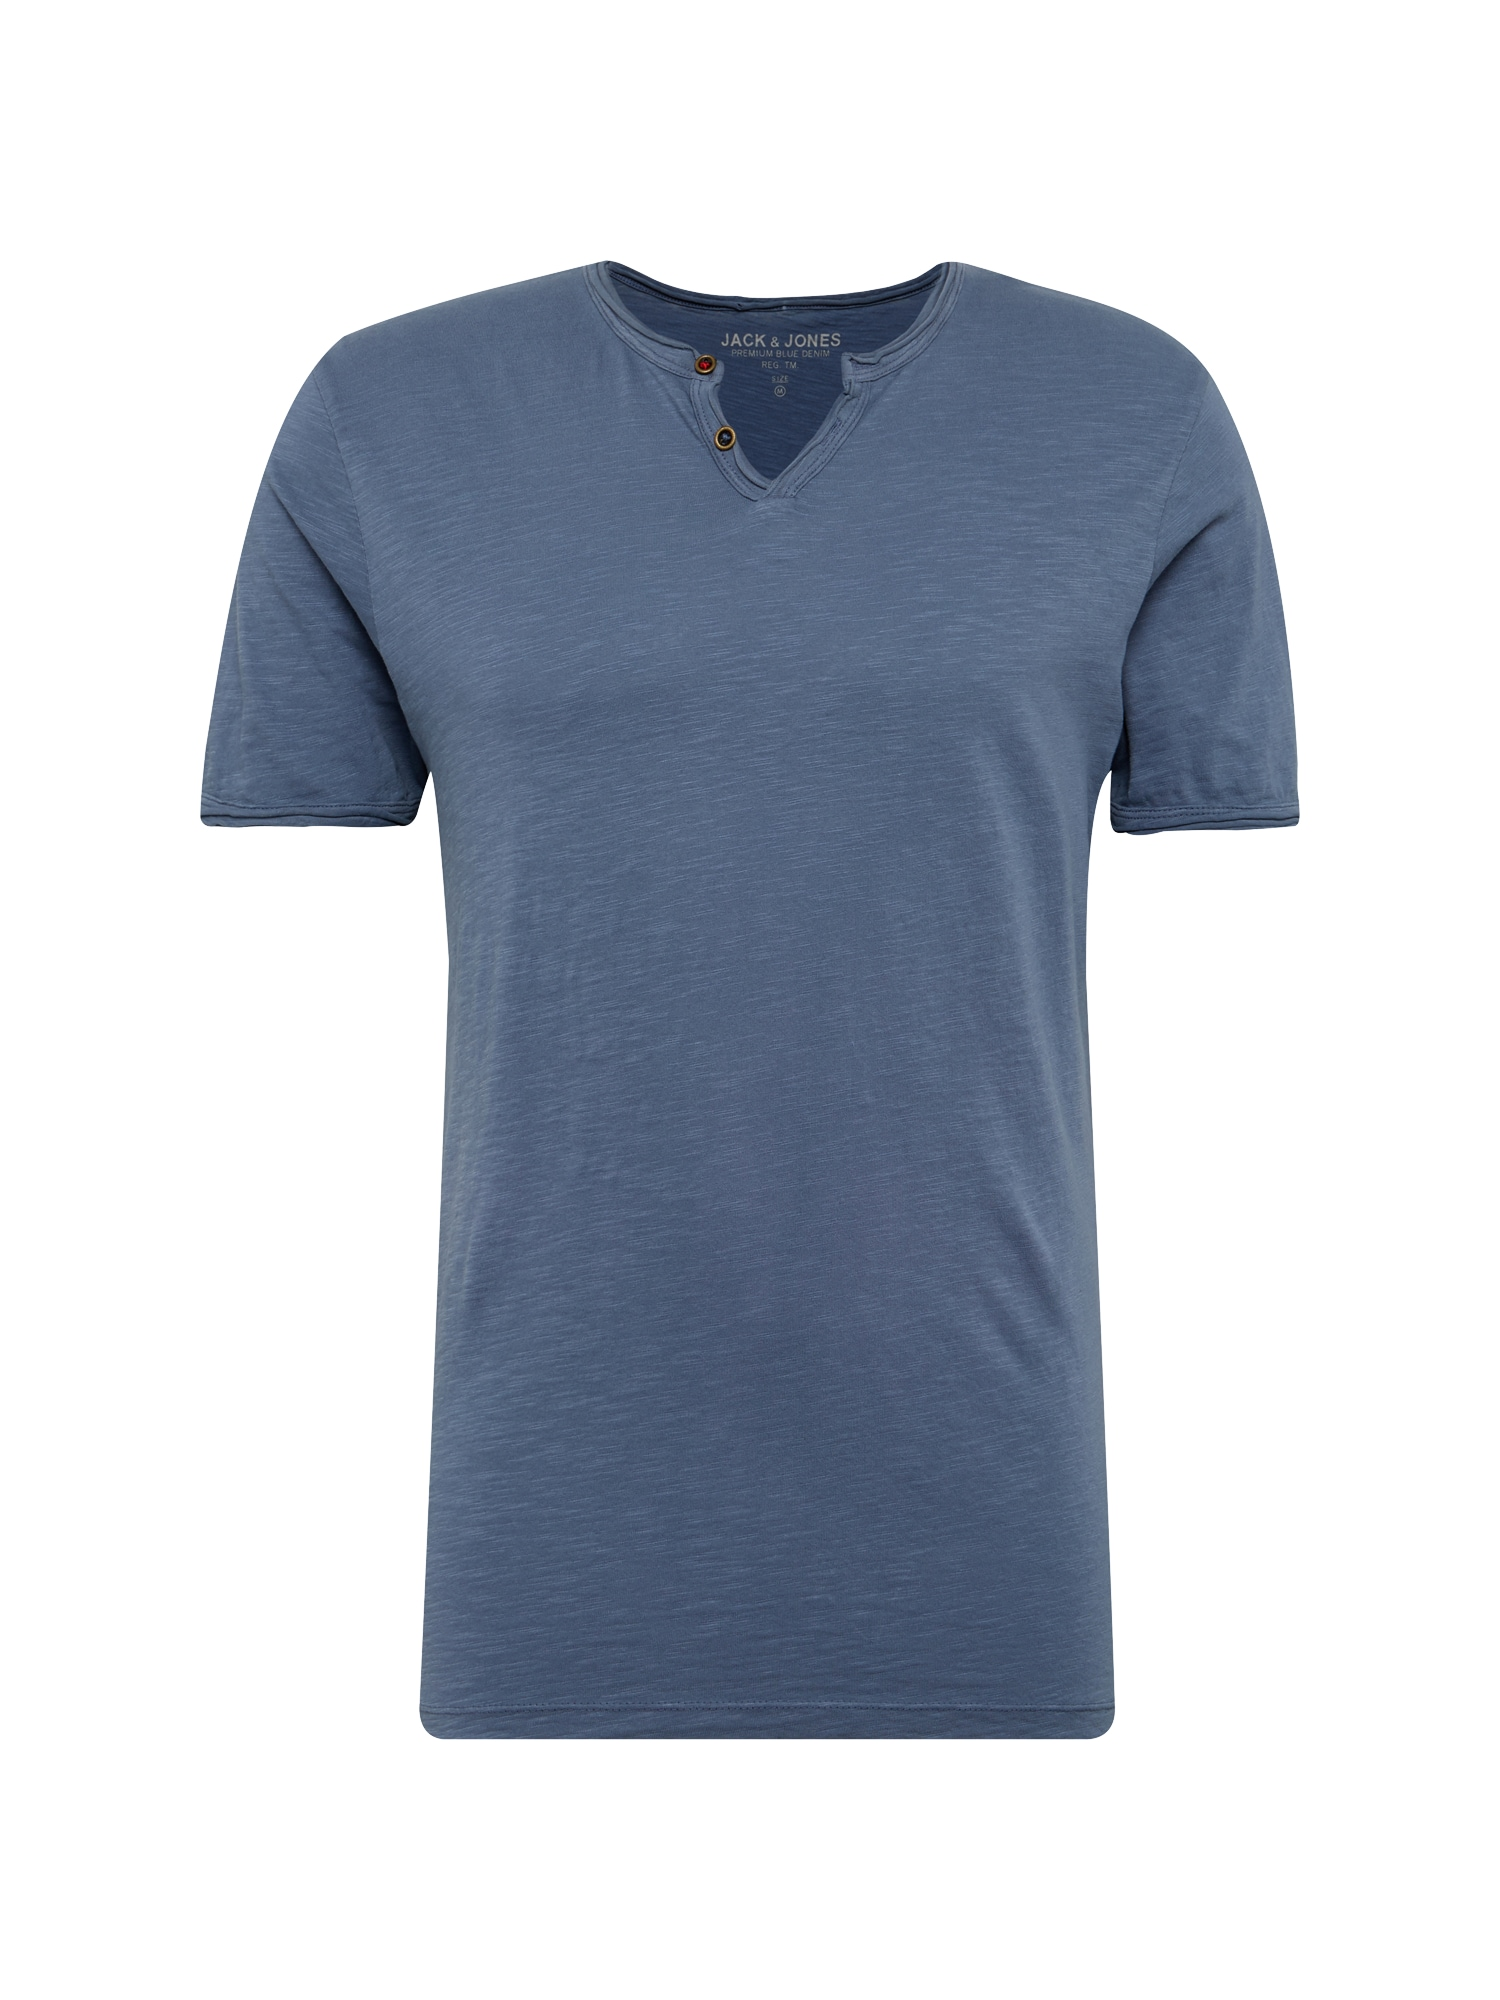 JACK & JONES Marškinėliai mėlyna